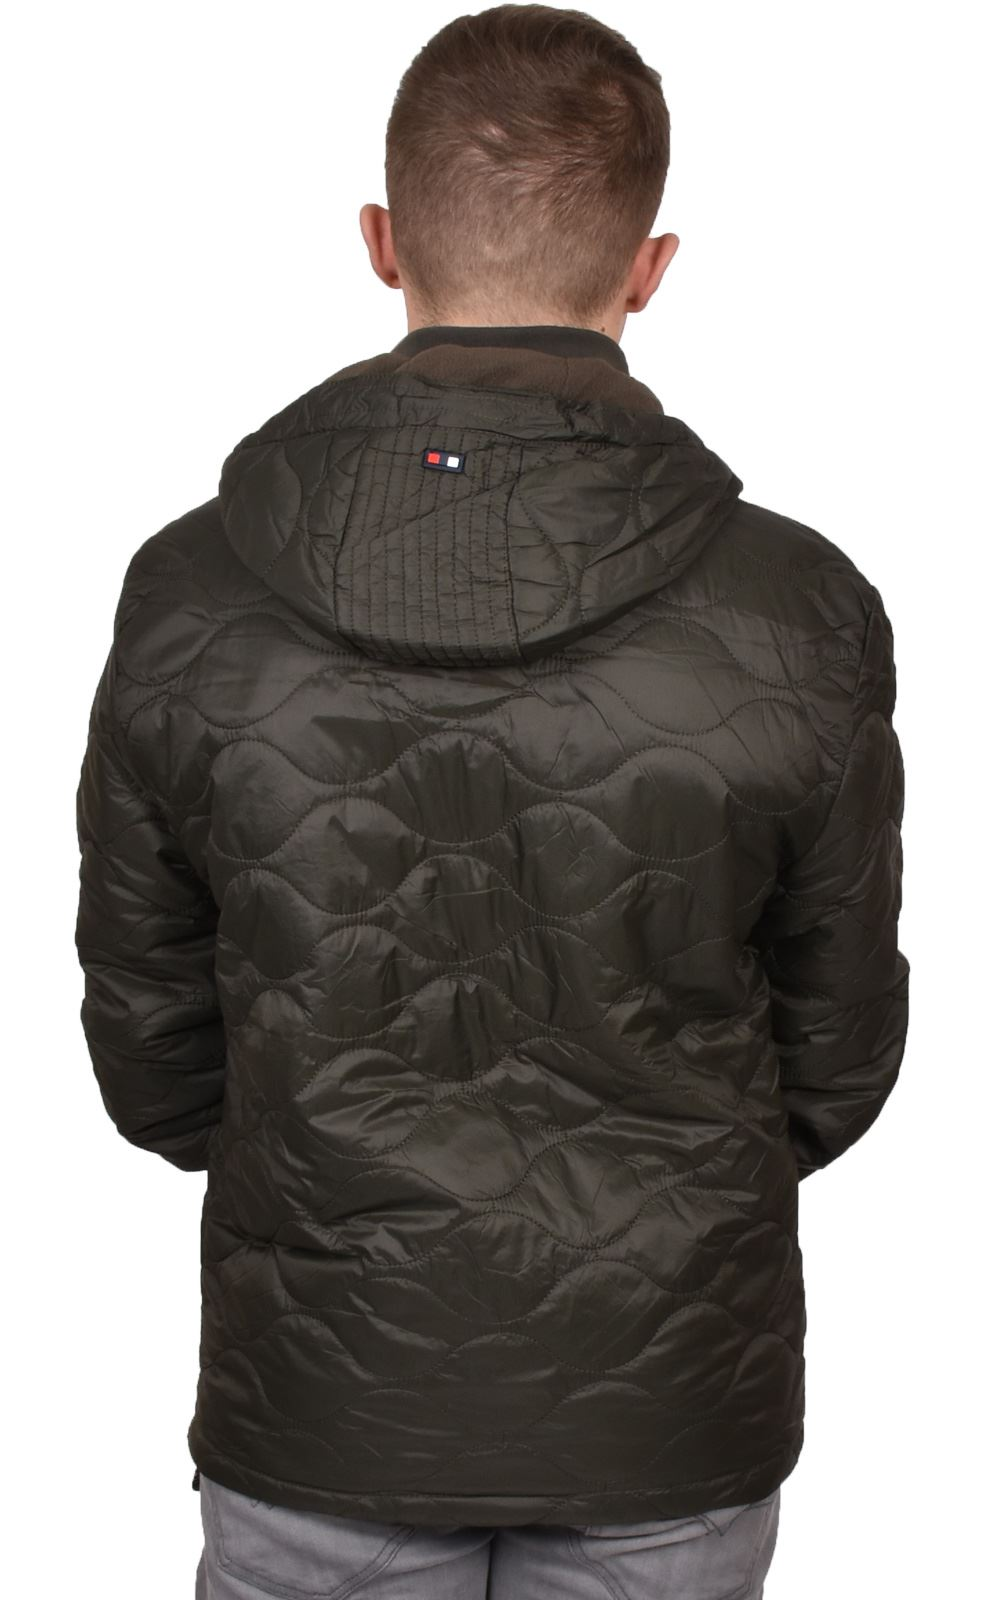 Mens-Smith-amp-Jones-Jacket-Full-Zip-Fleece-Lined-Hooded-Light-Weight-Warm-Coat thumbnail 17